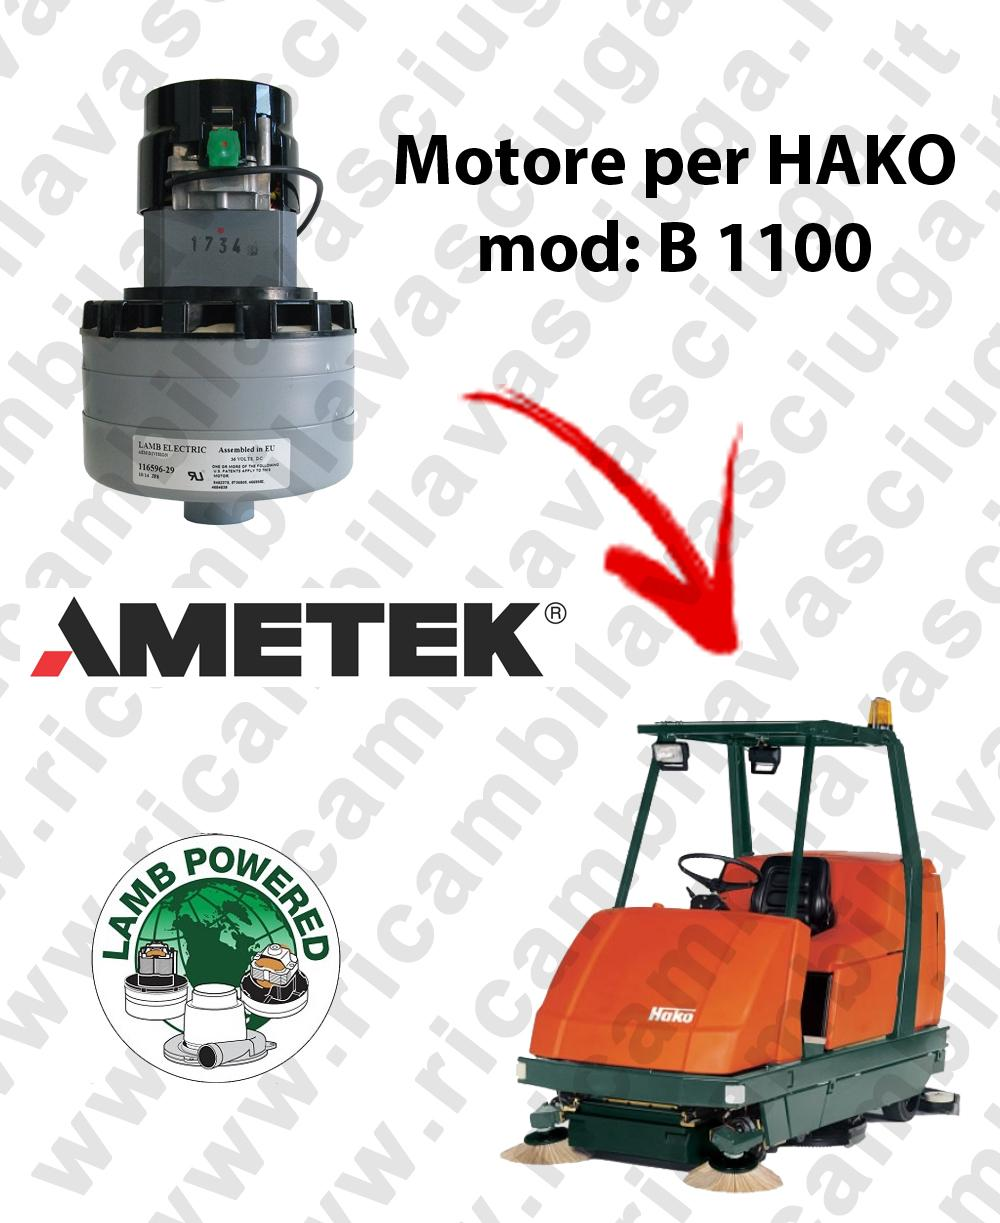 B 1100 MOTORE LAMB AMETEK di aspirazione per lavapavimenti HAKO